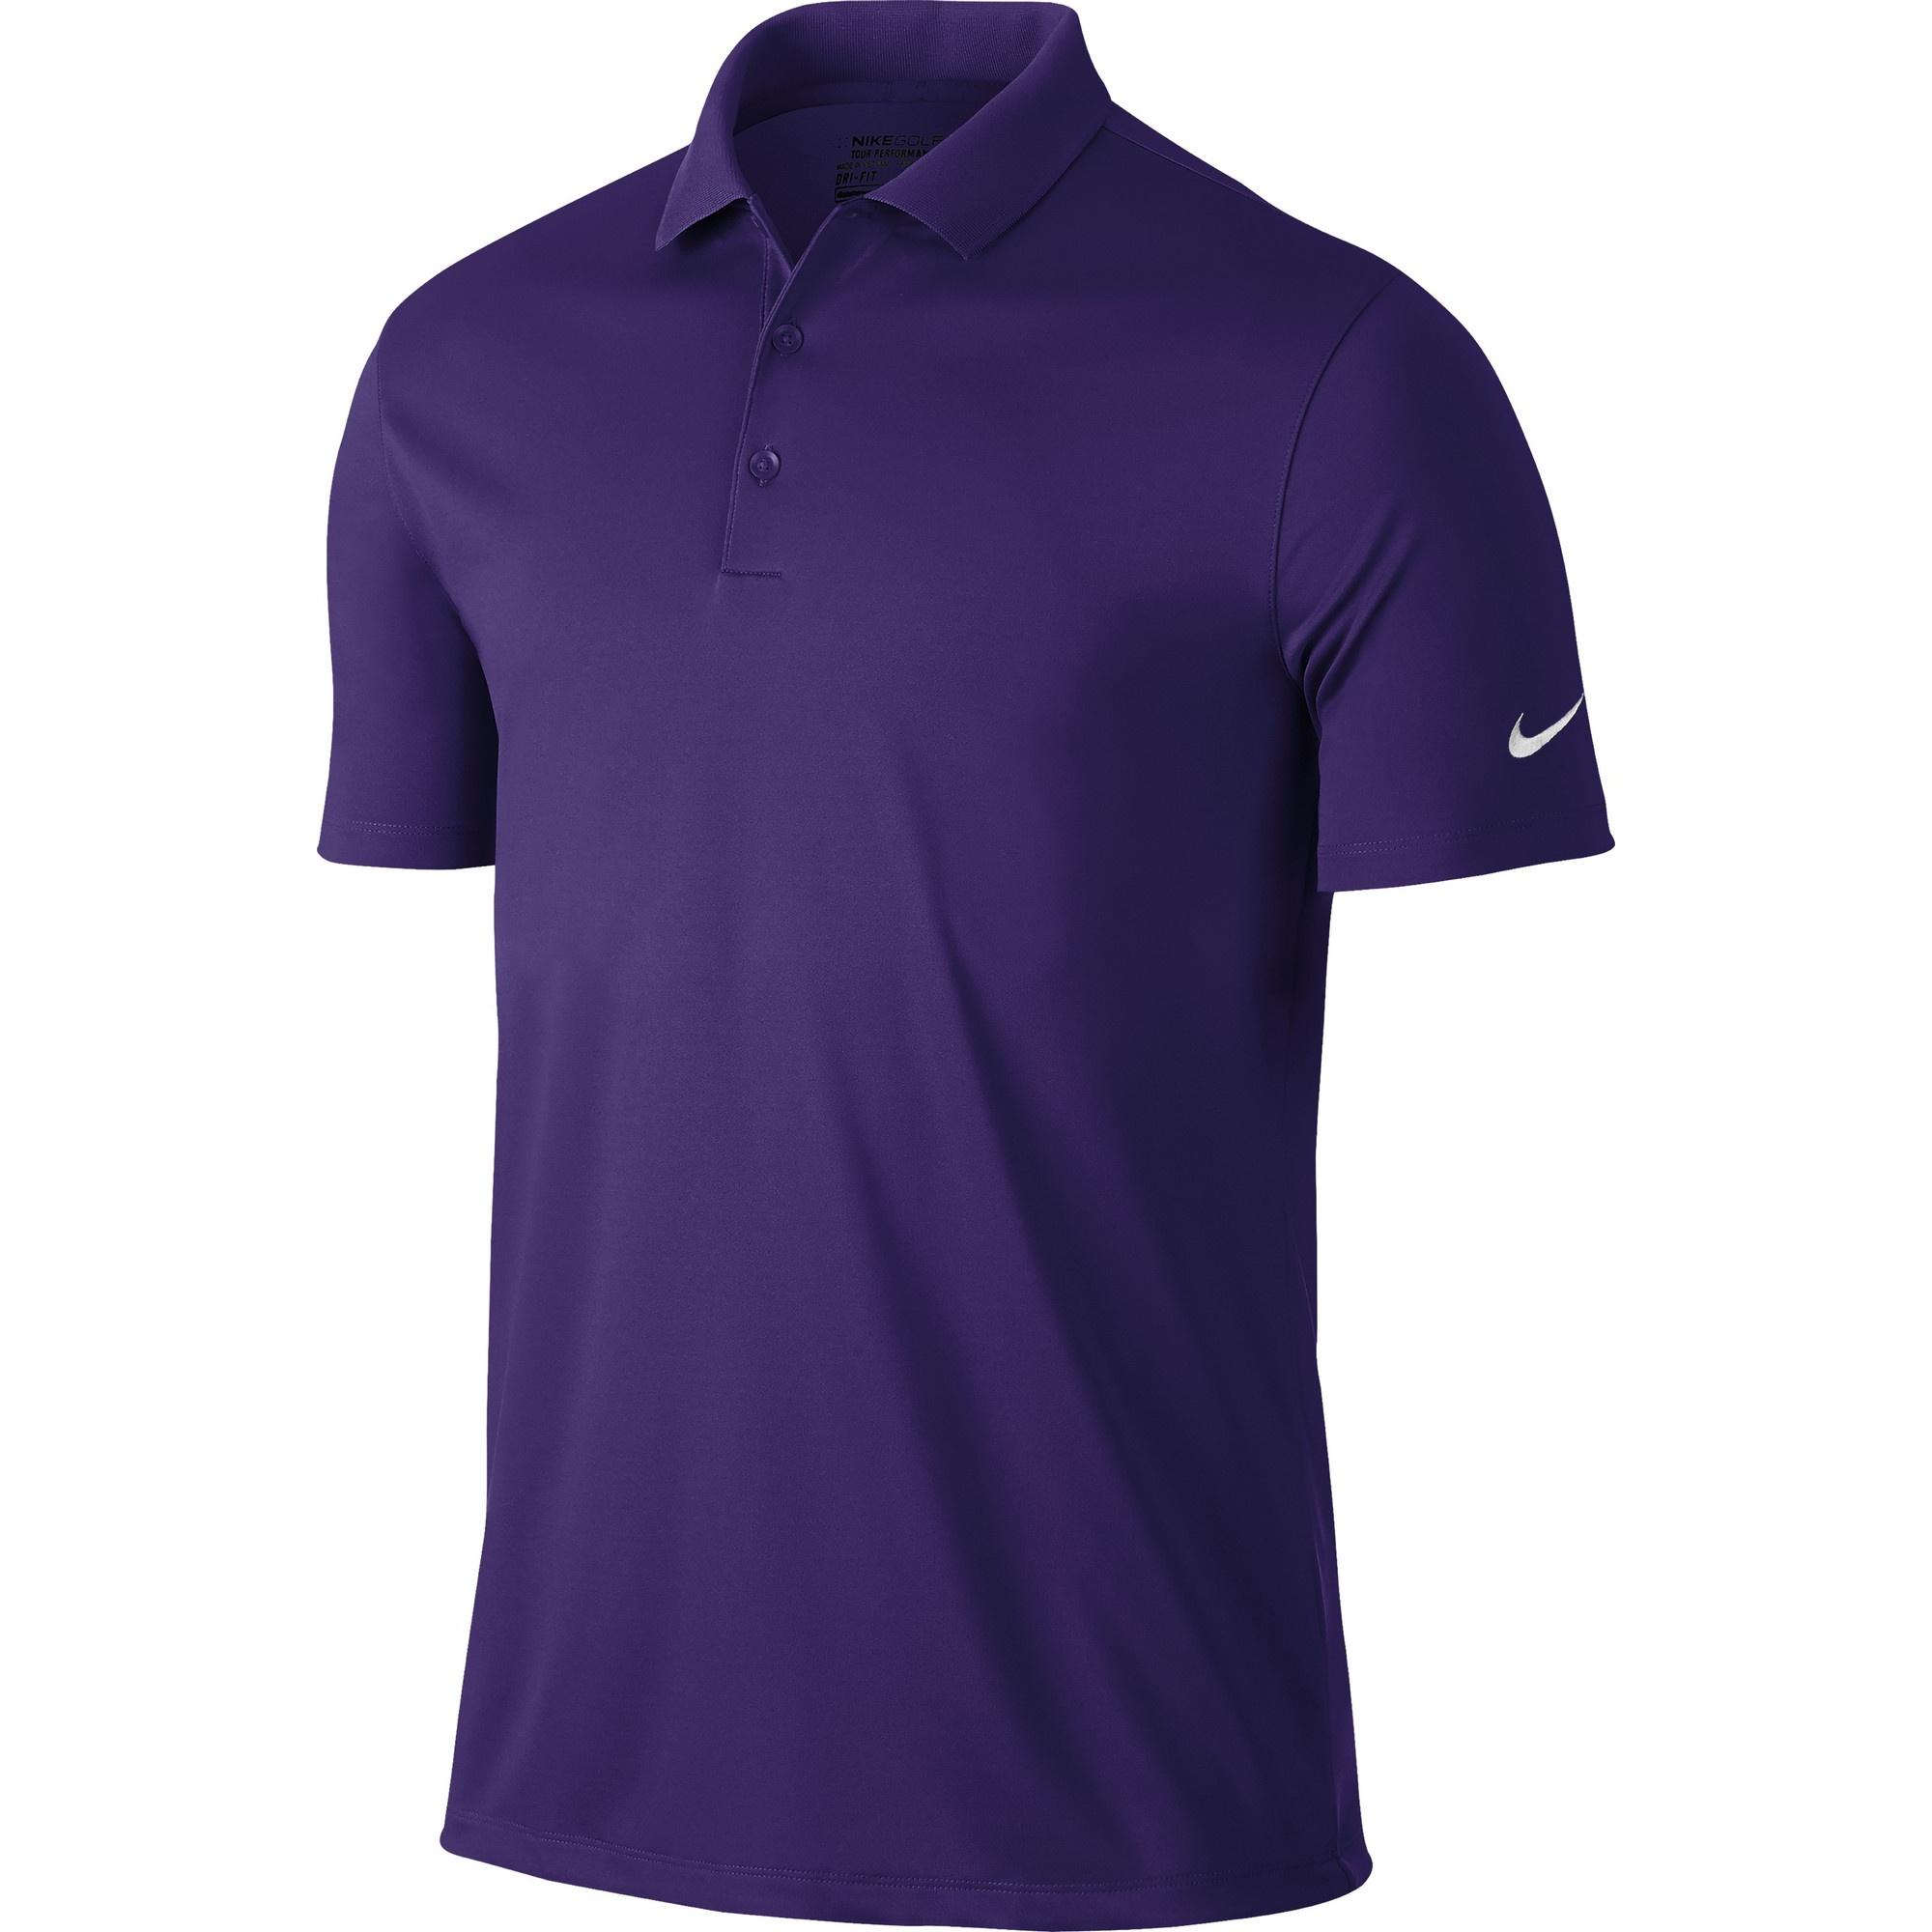 Nike mens victory short sleeve solid polo shirt ebay for Nike golf victory polo shirt